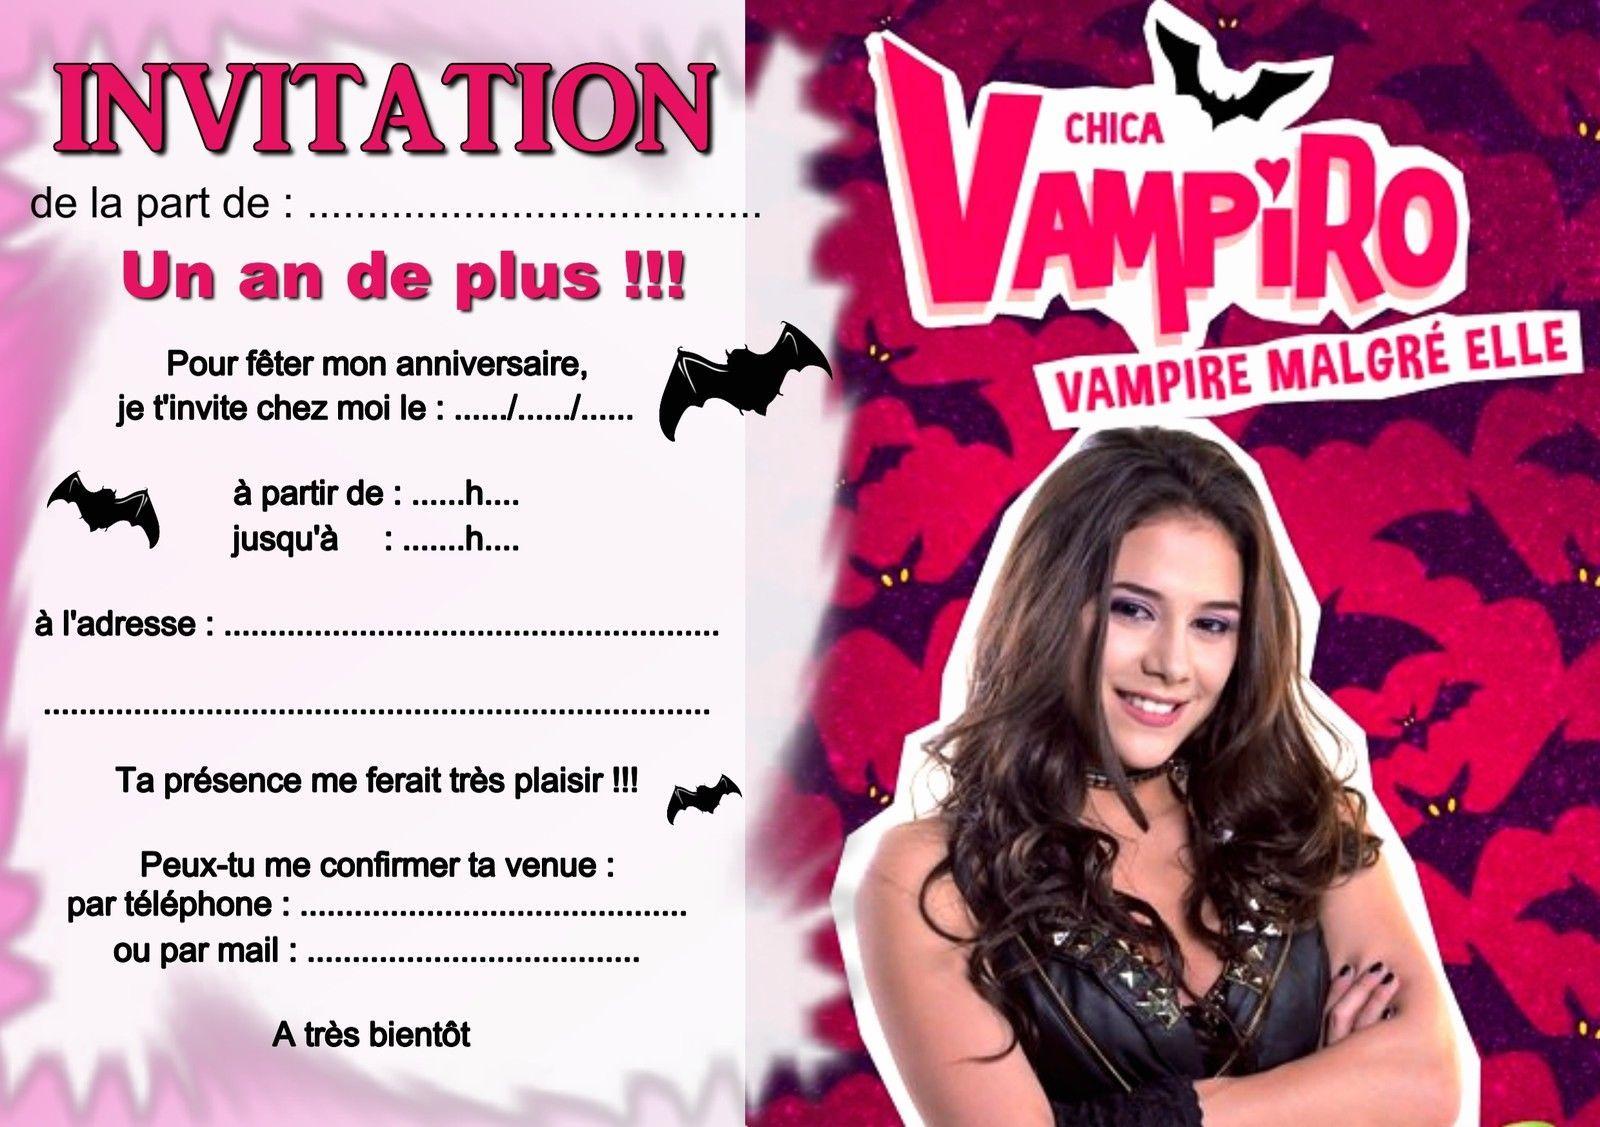 Connu 5 ou 12 cartes invitation anniversaire chica vampiro REF 325 • EUR  NR61